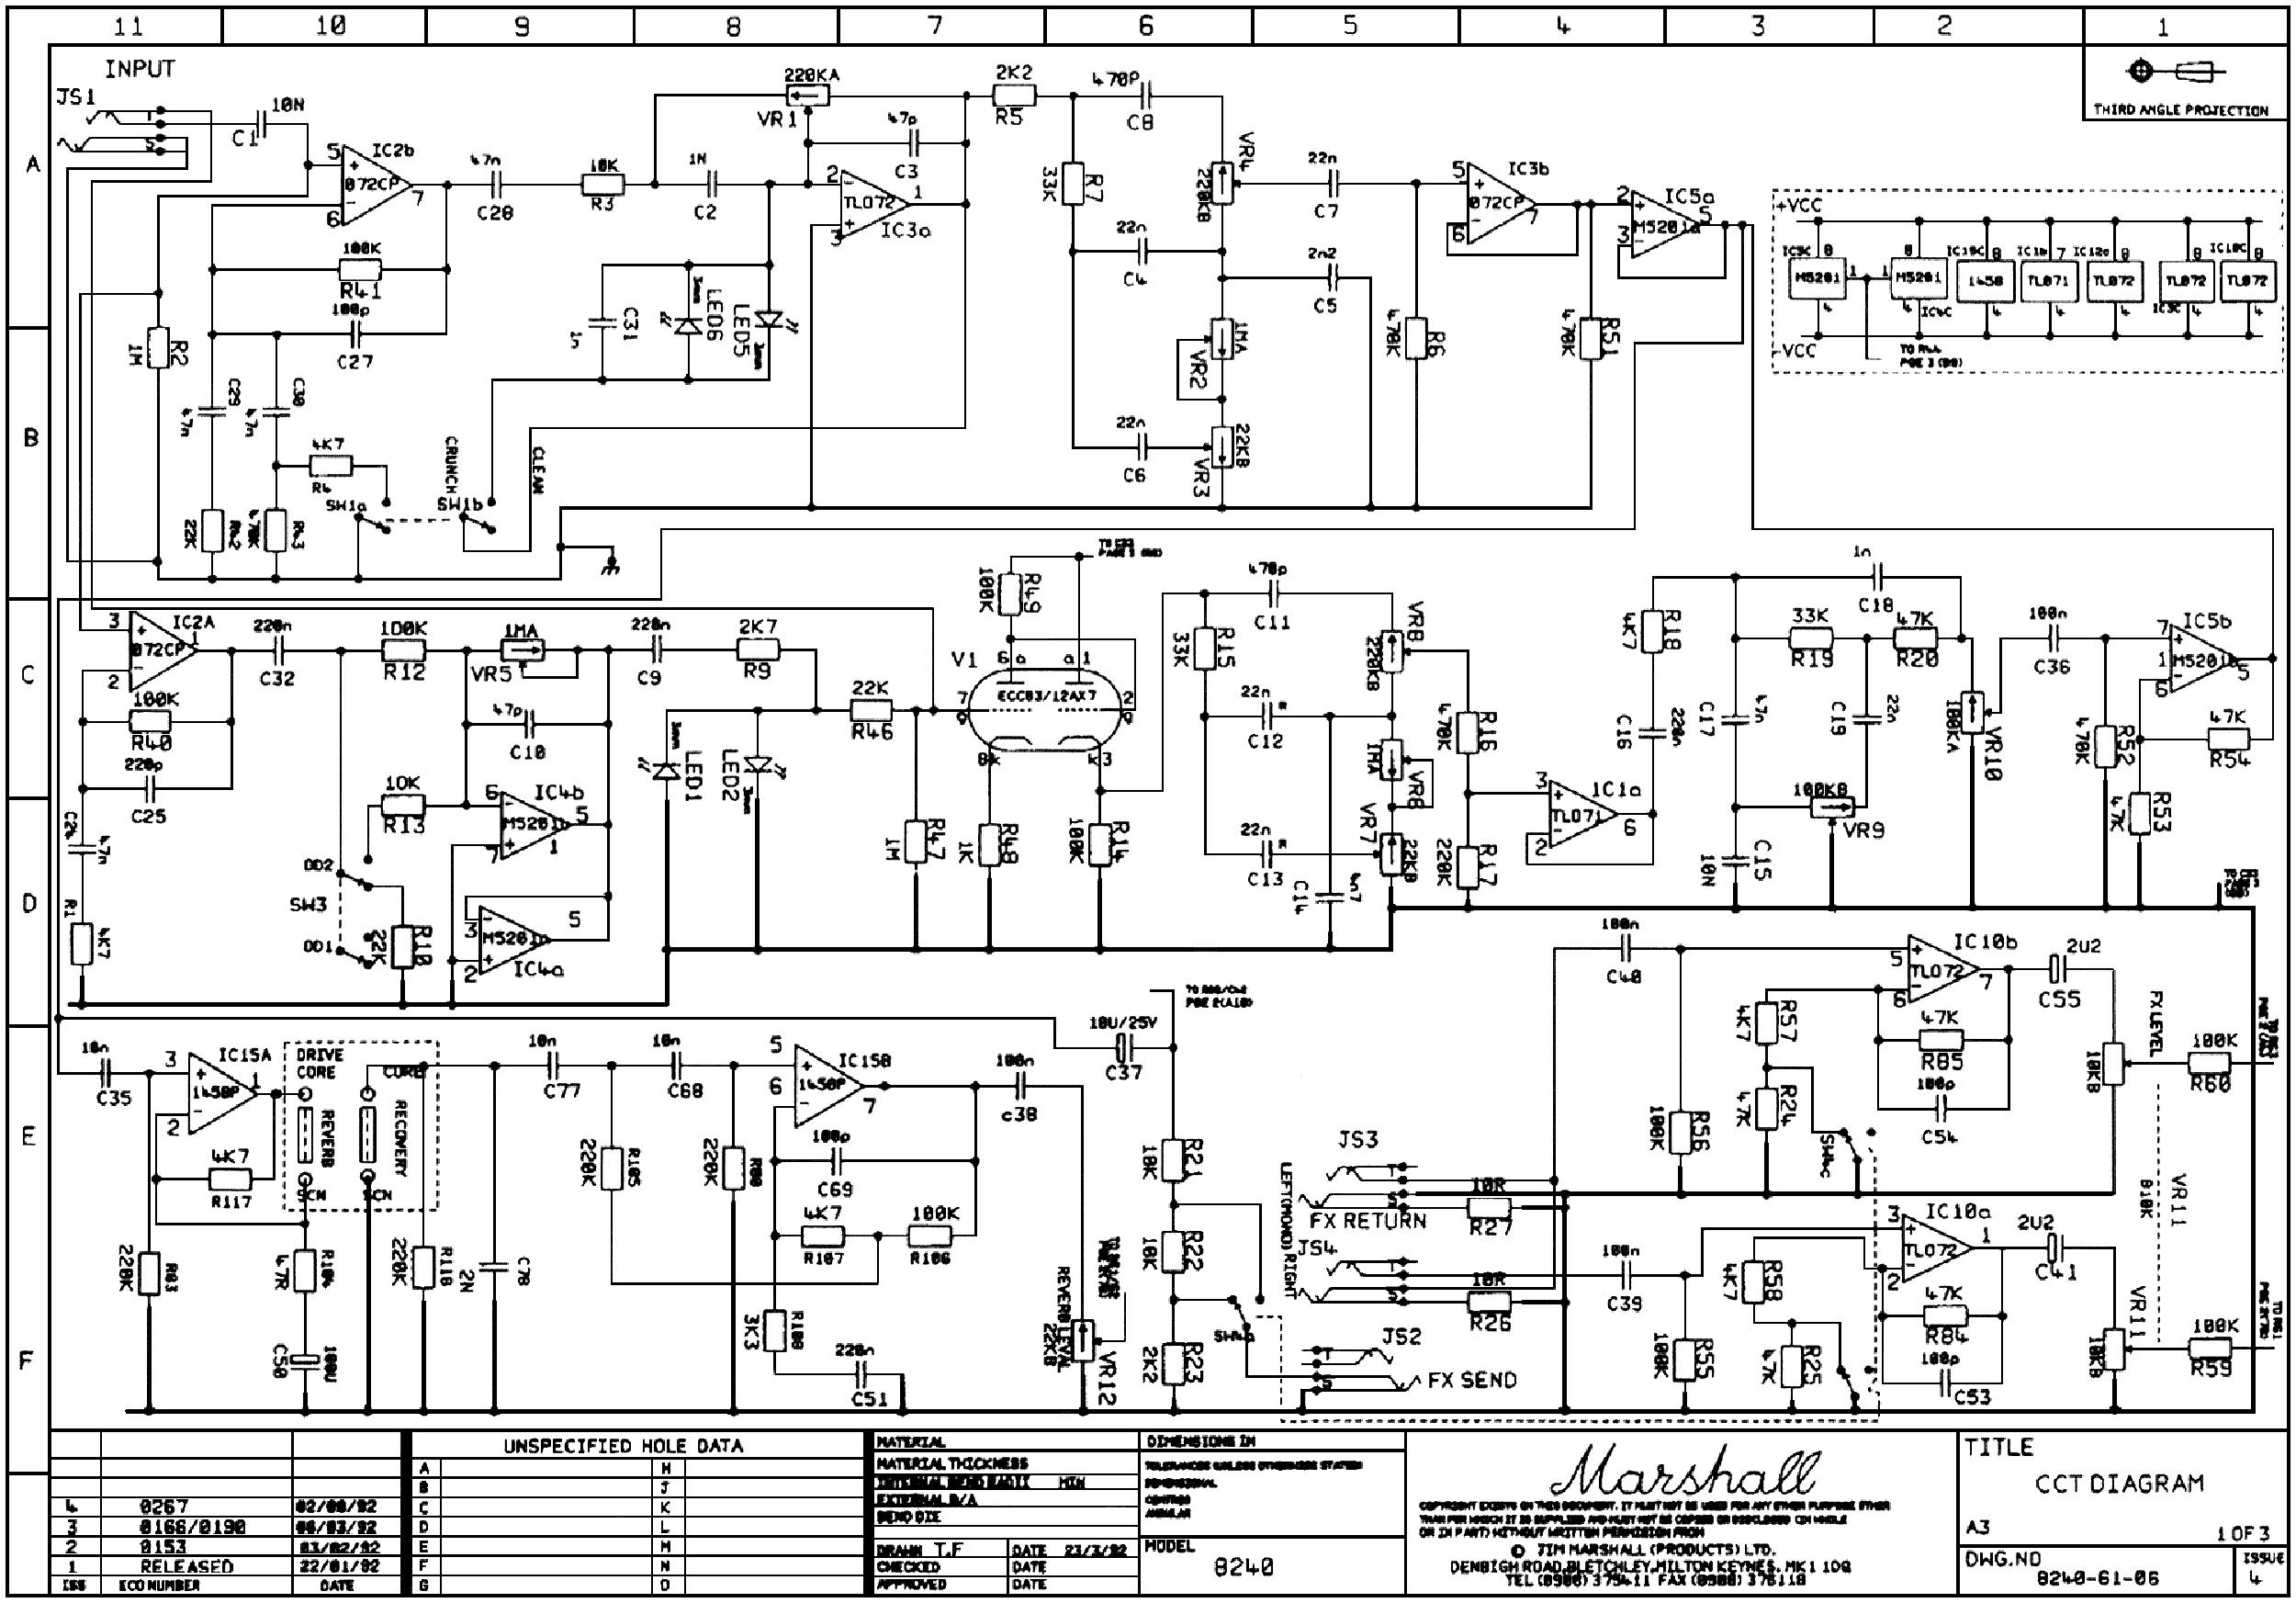 Marshall Stereochorusrev 2x40w 8240 Service Manual